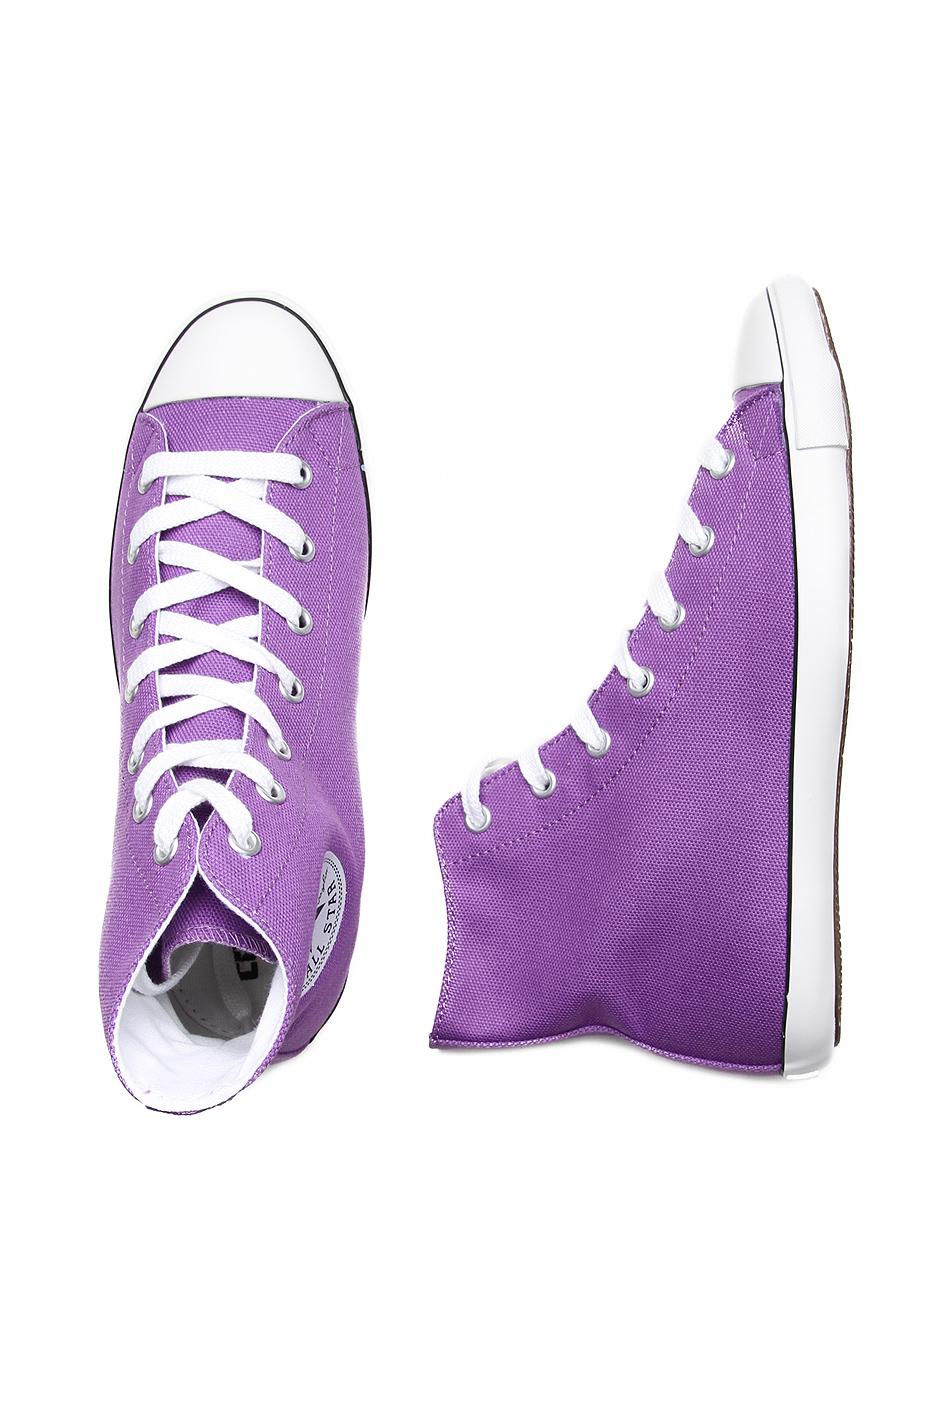 04b7fc35d6871 Converse - AS Light Hi Can Purple/White - Girl Shoes